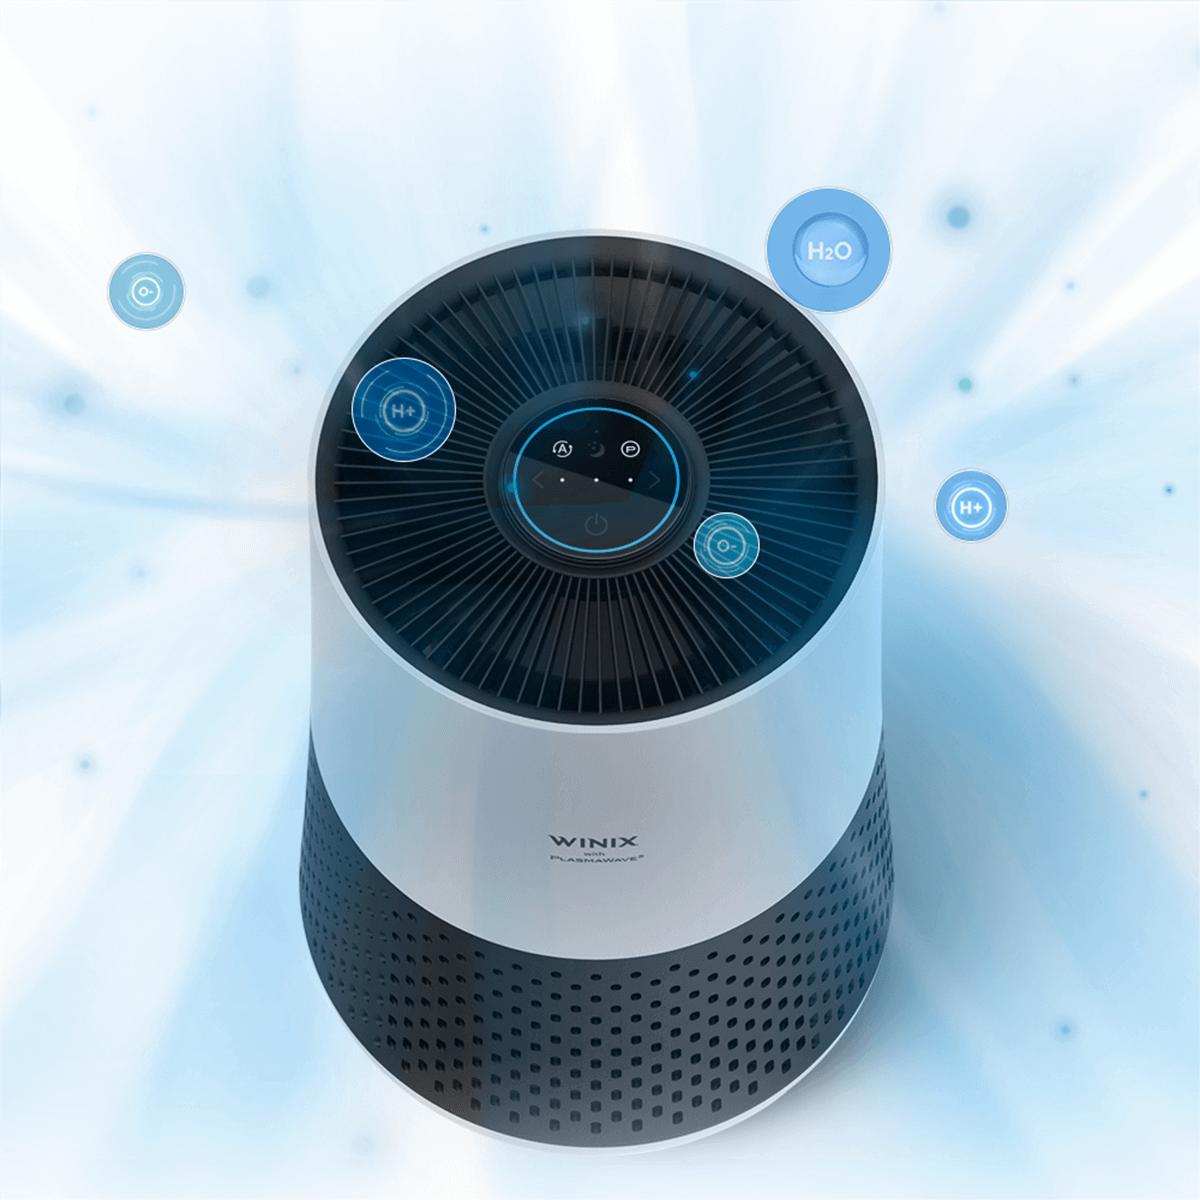 Winix zero compact hava temizleme cihazı plasmawave